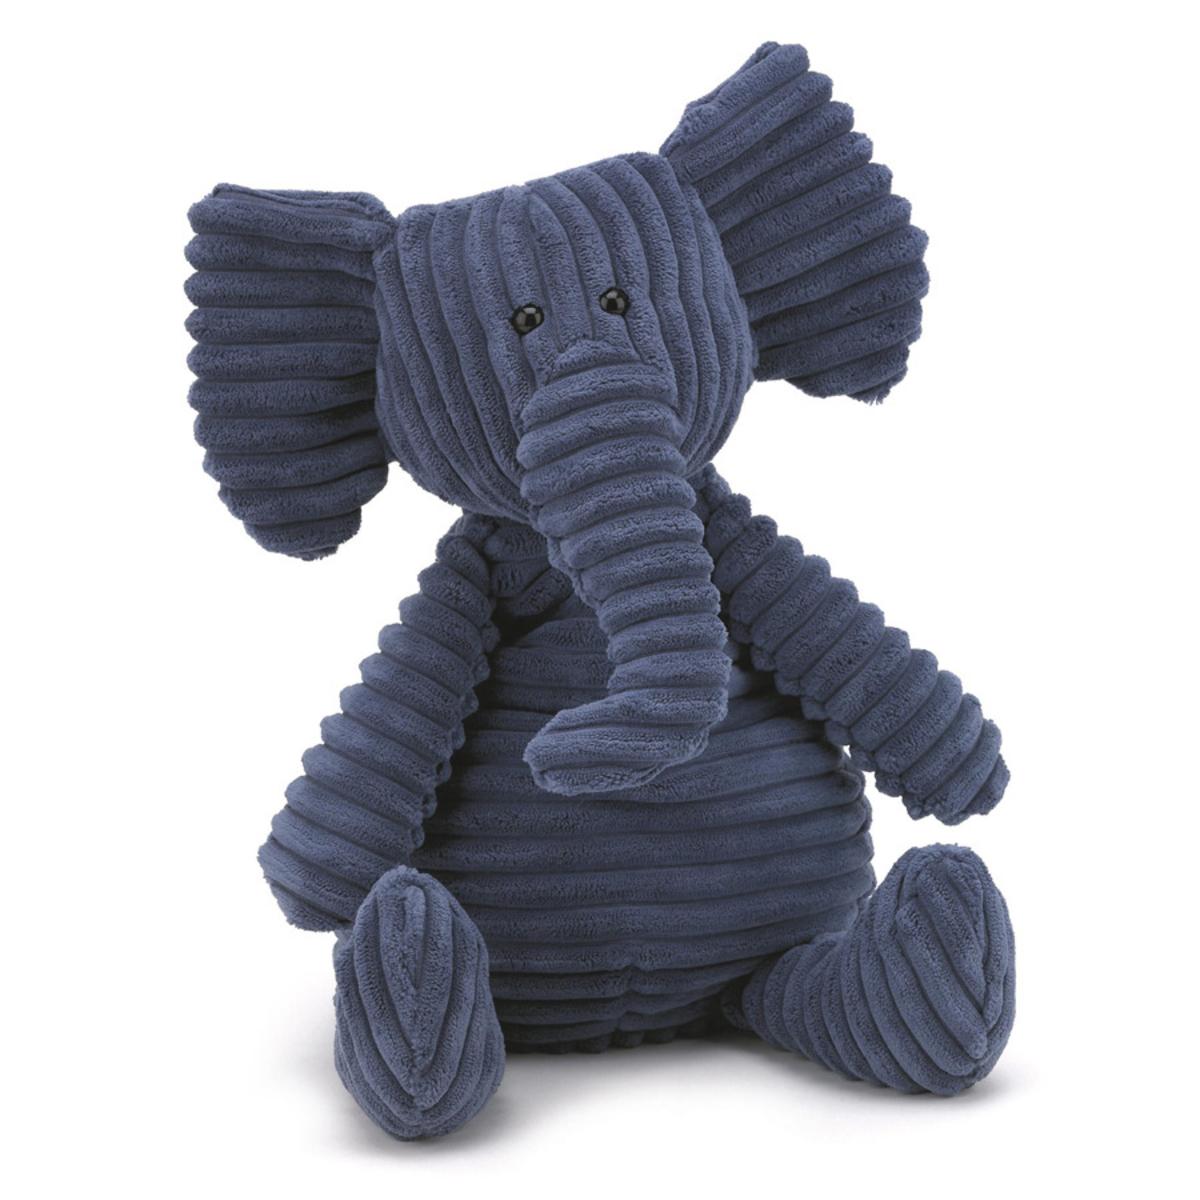 Peluche Peluche Cordy Roy Elephant 38 cm Peluche Cordy Roy Elephant 38 cm